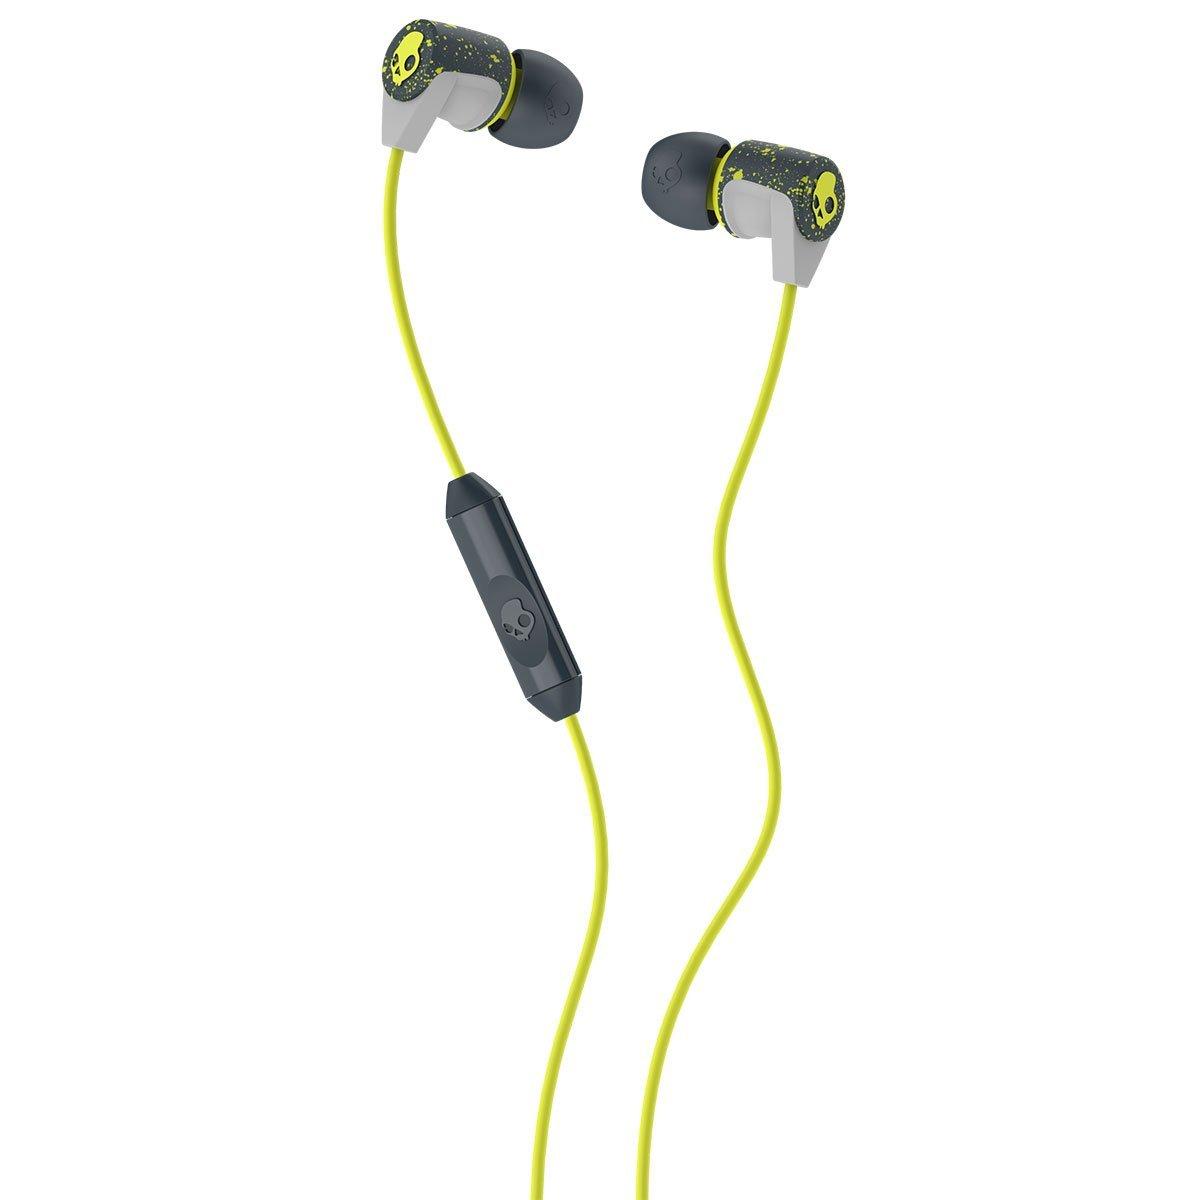 hight resolution of skullcandy riff s2rfgy 386 in ear headphones image